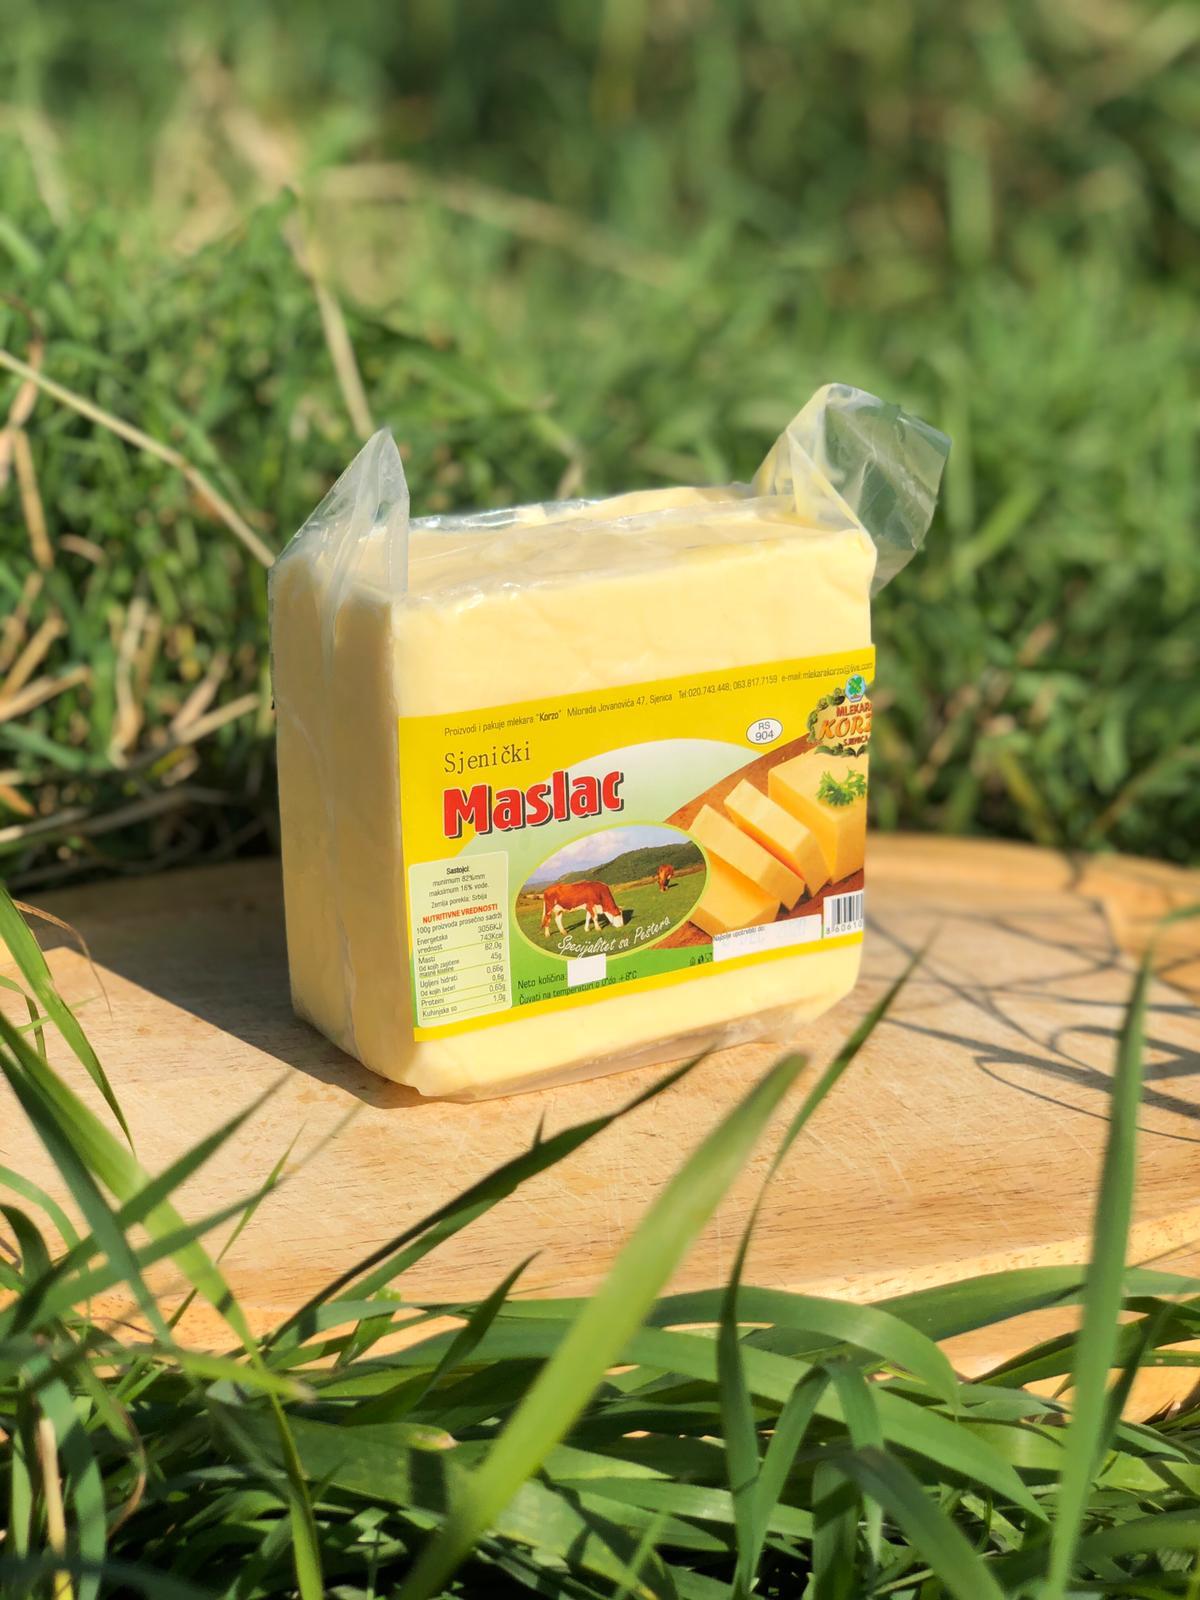 sjenicki-maslac-mlekara-korzo